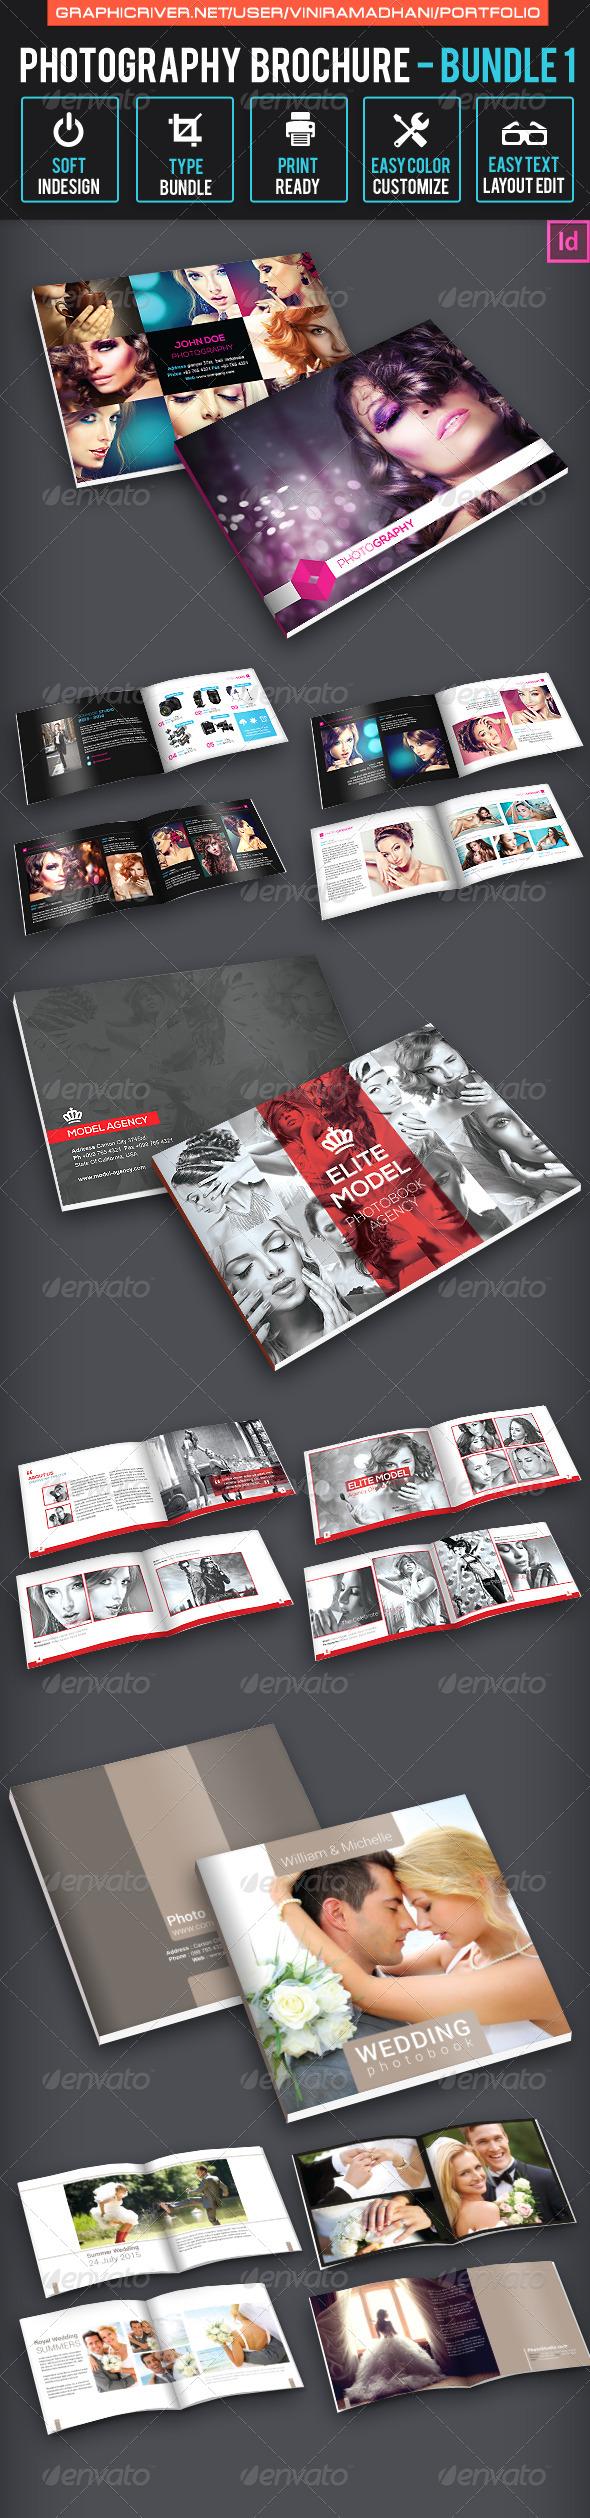 GraphicRiver Photography Brochure Bundle 1 7094933